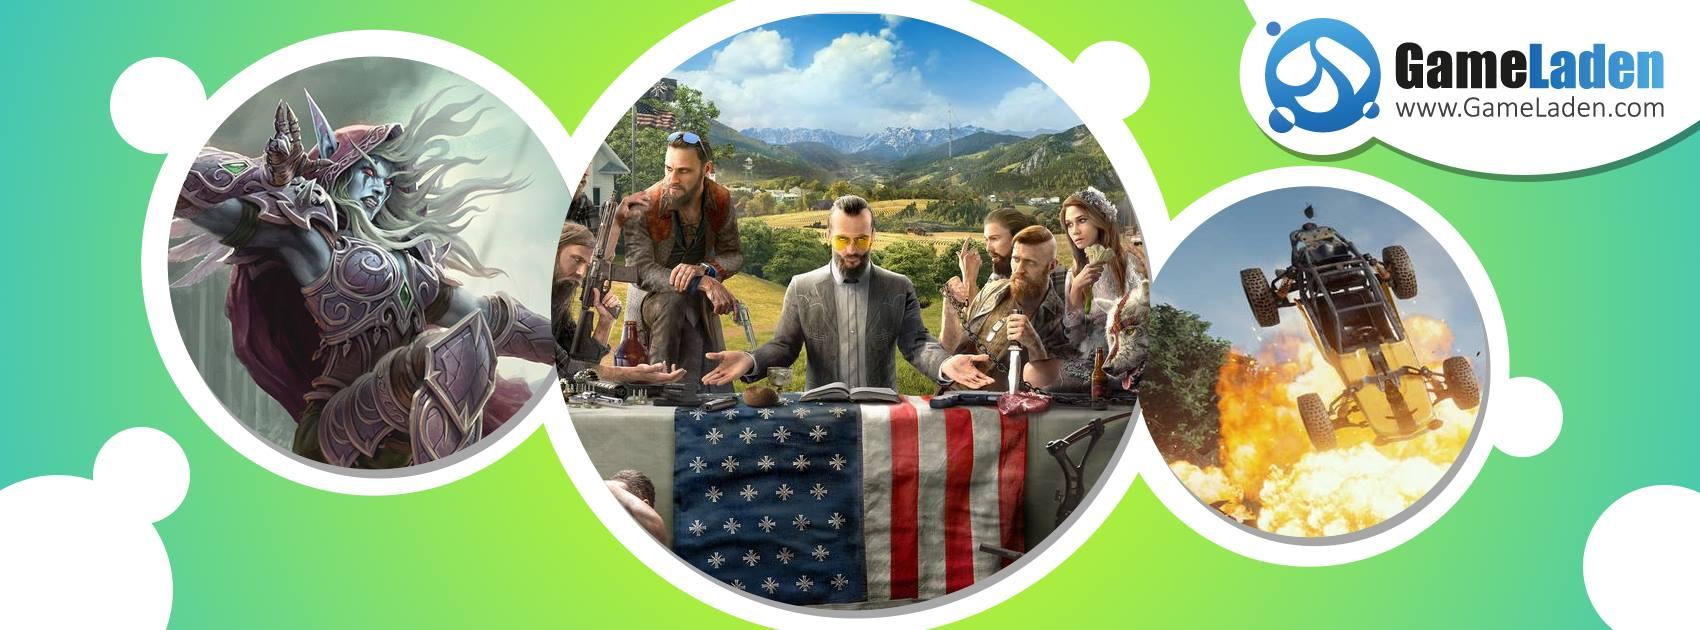 About GameLaden Homepage